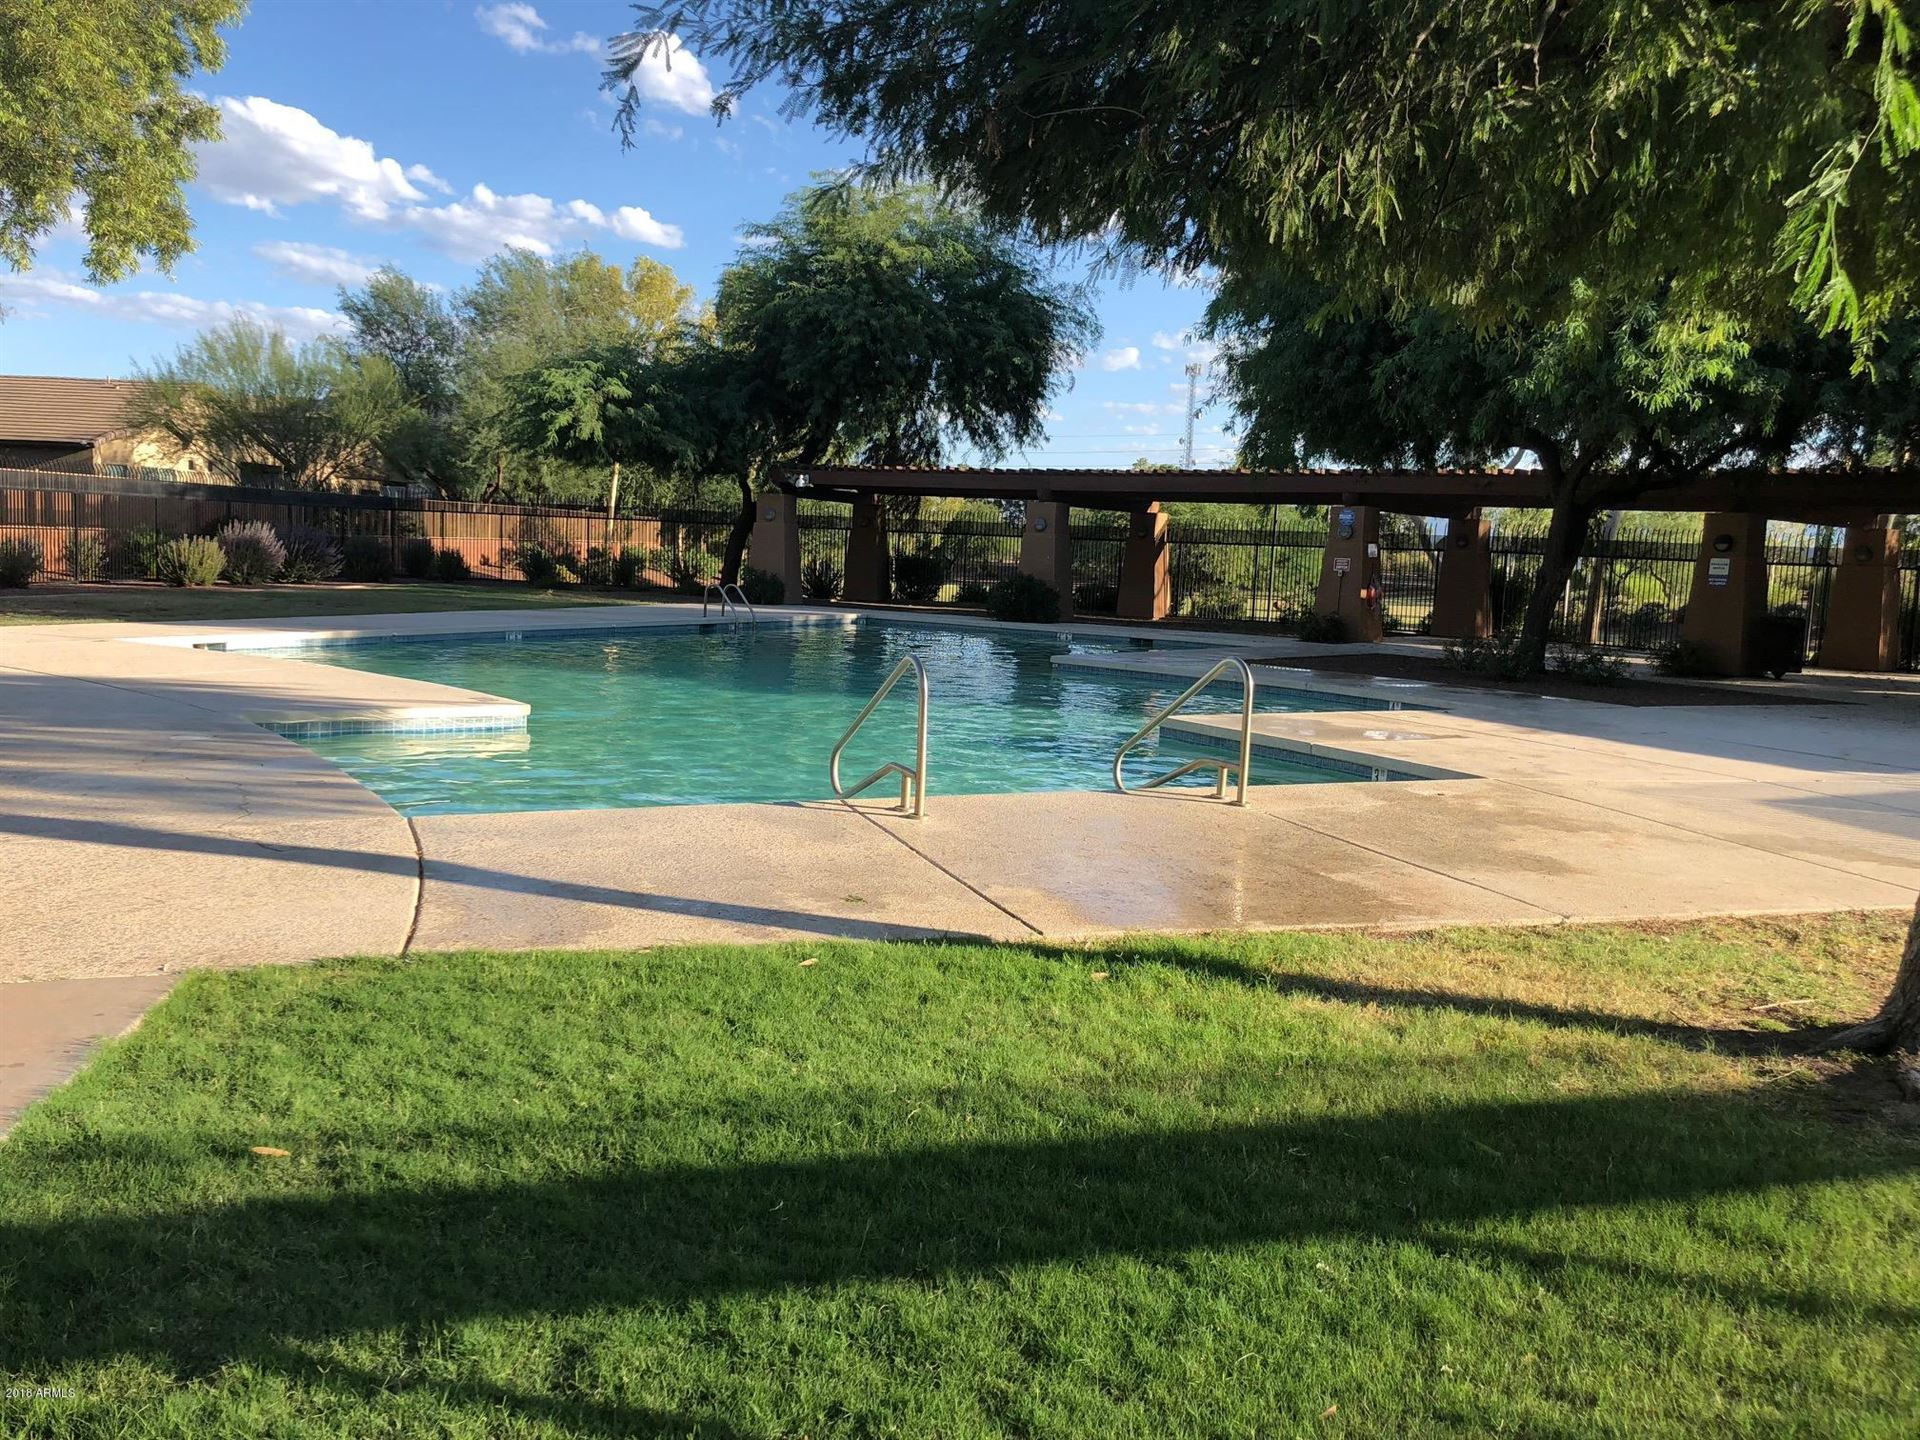 Photo of 11713 W LINCOLN Street, Avondale, AZ 85323 (MLS # 6266236)